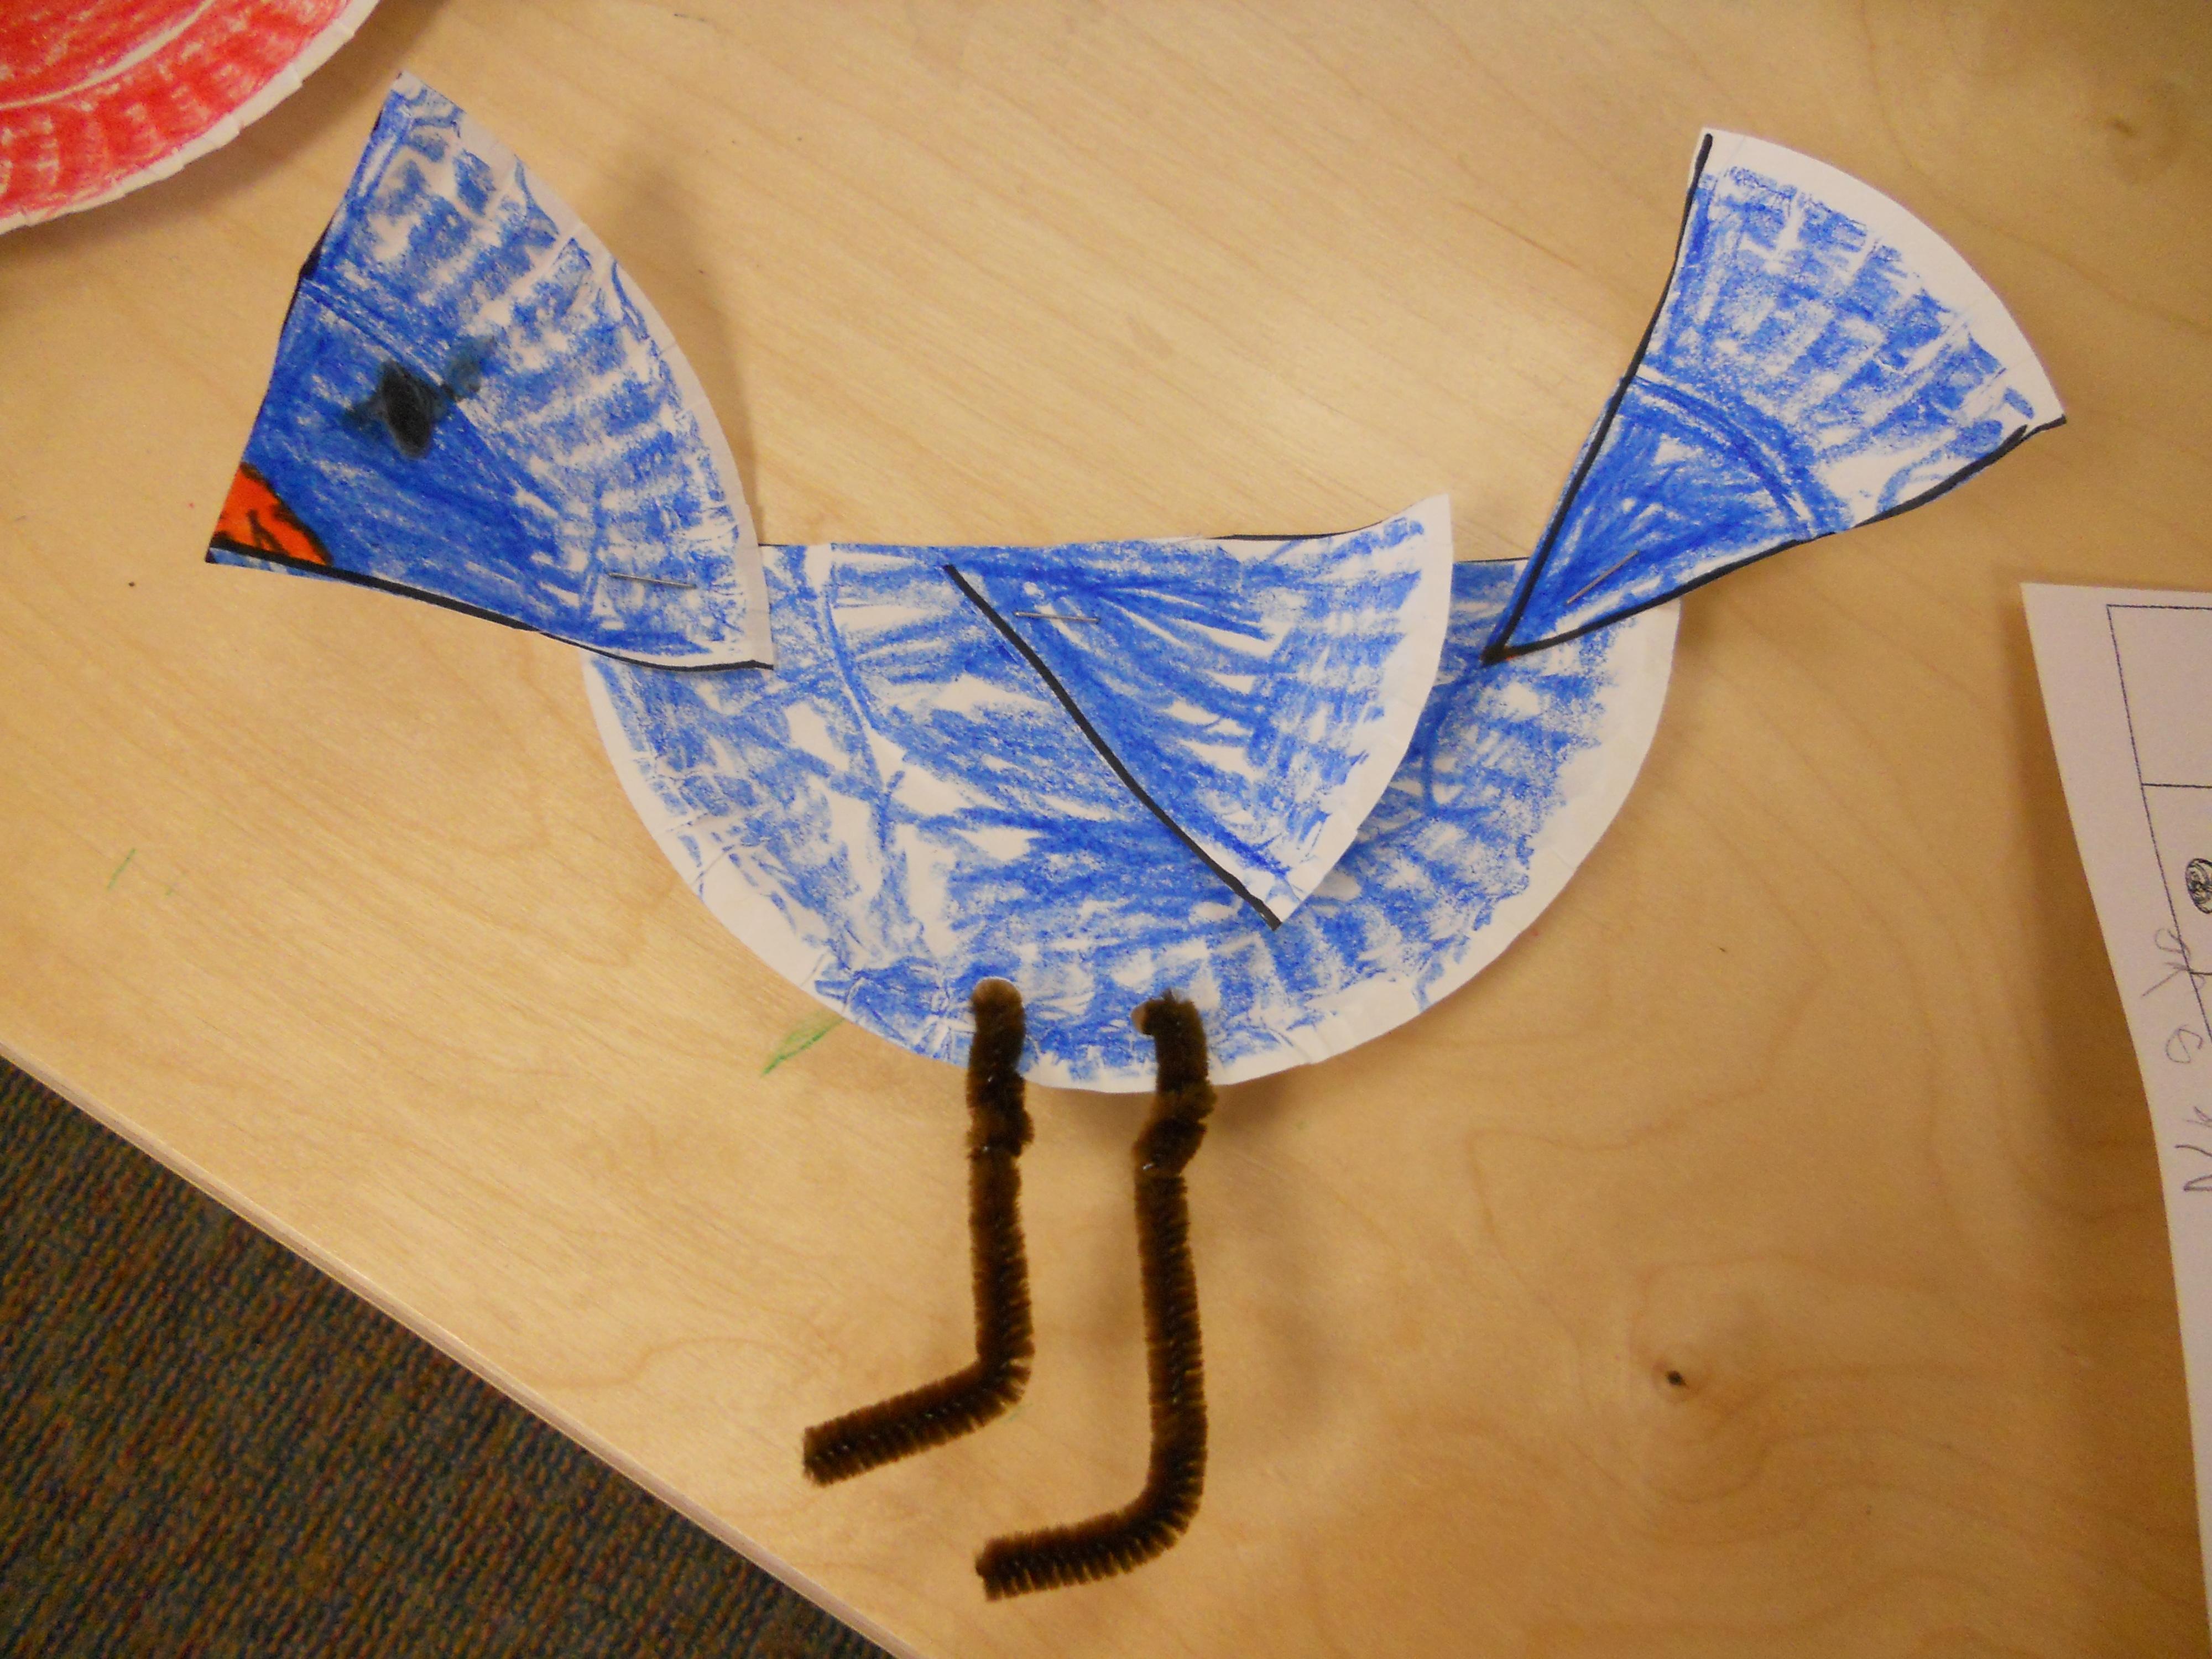 CoolPix2 008 & My Montessori Journey: Paper Plate Bird Art Project